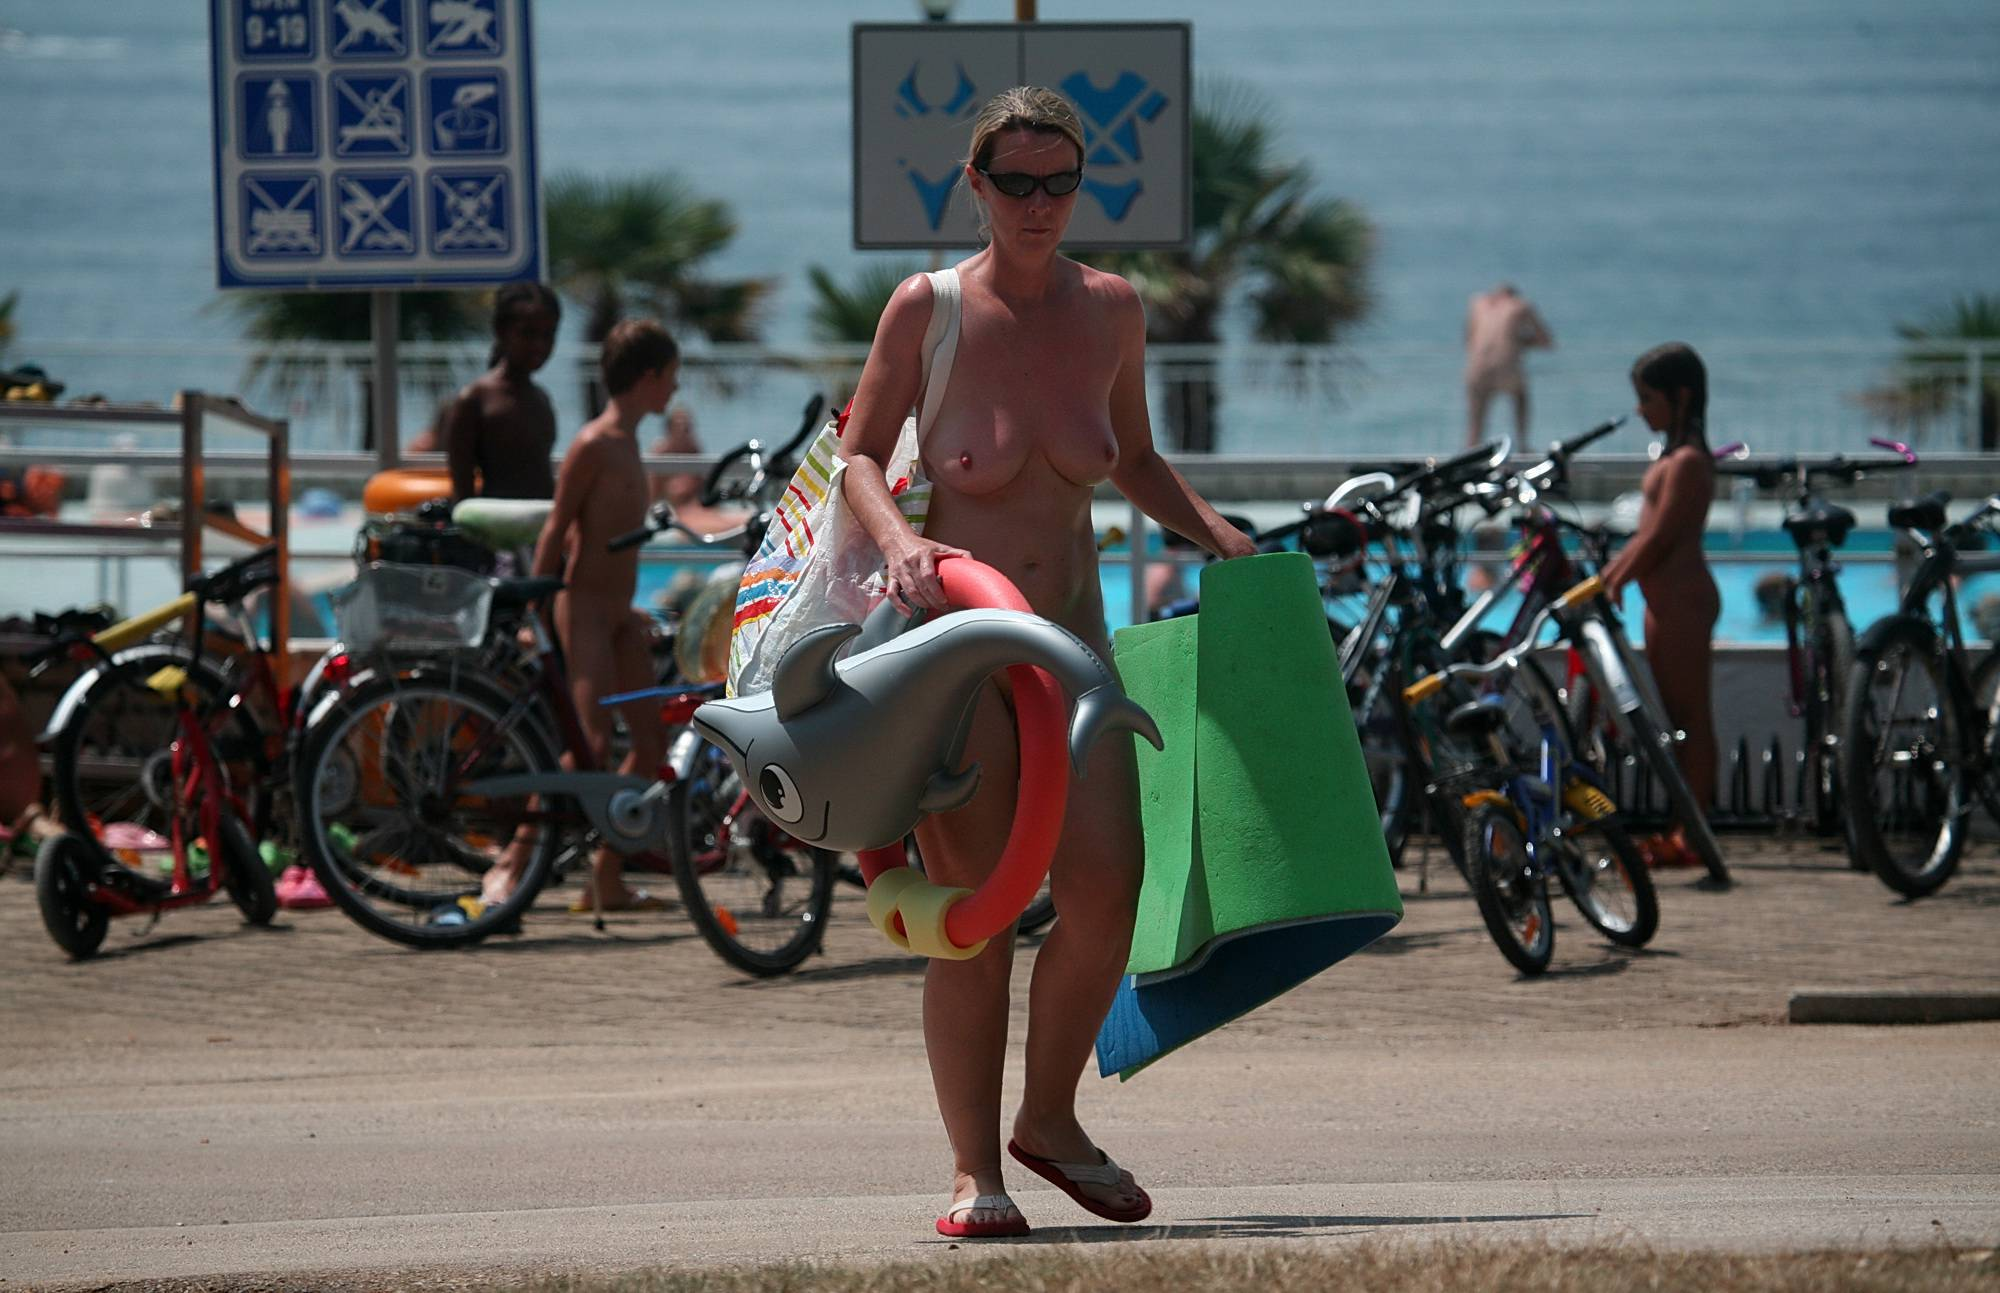 Purenudism Pics-Scooters and Bike Walks - 4